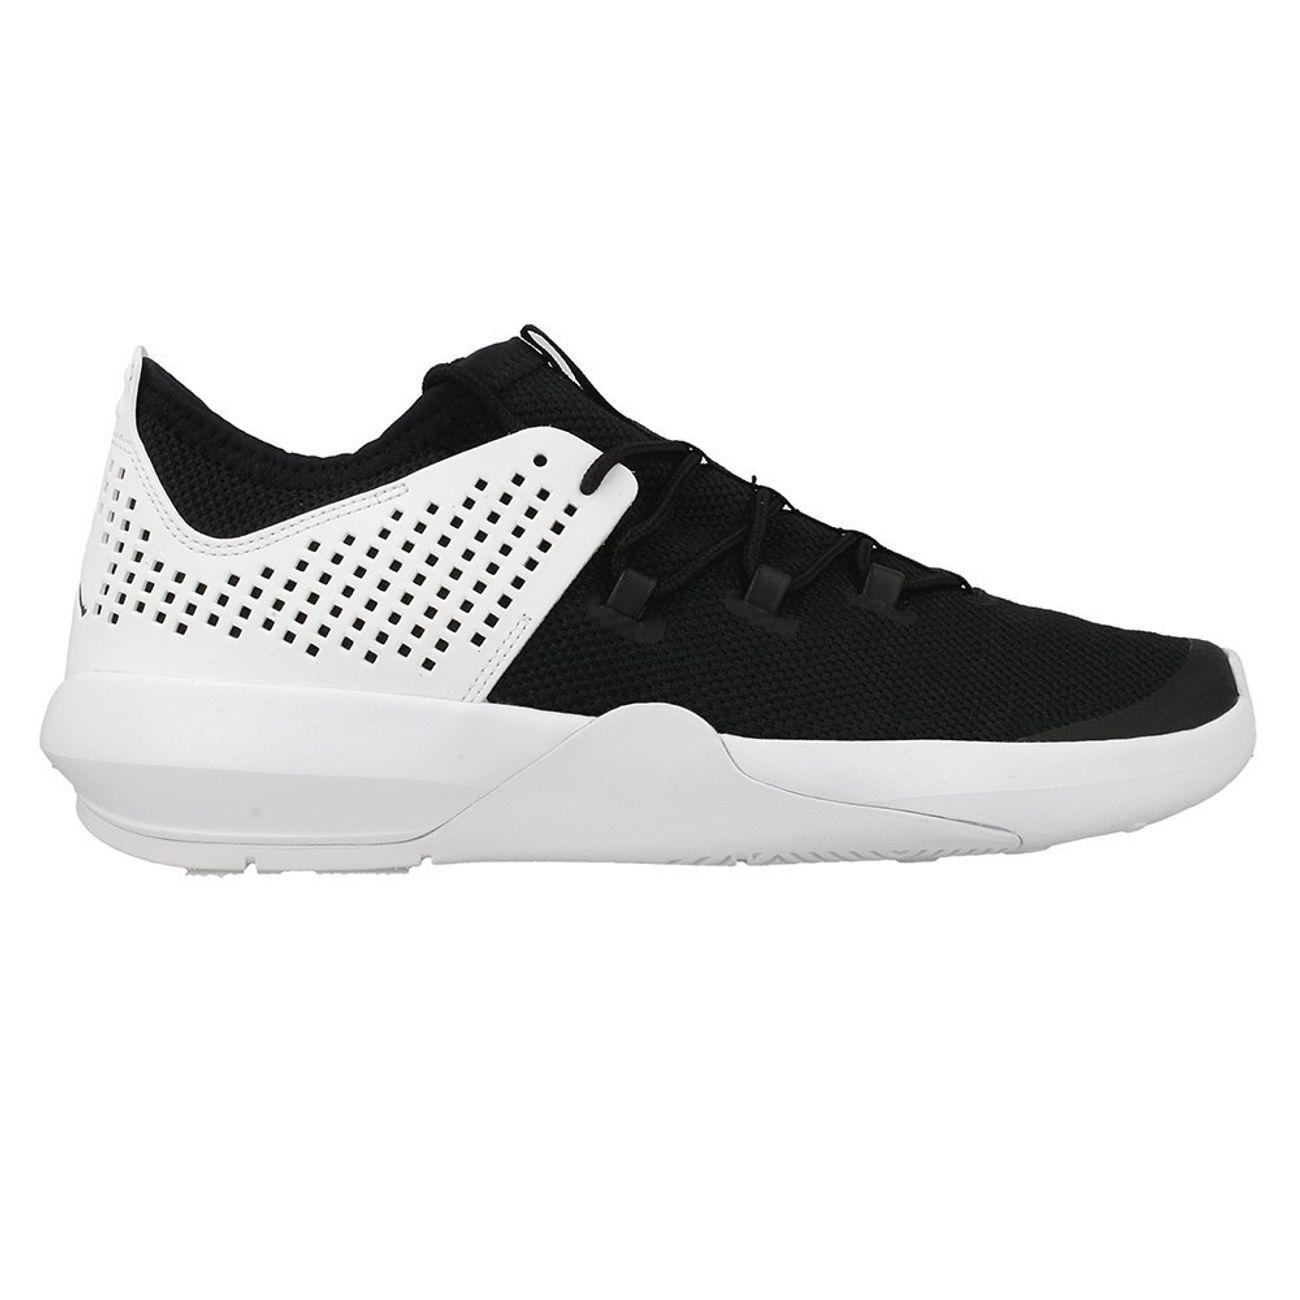 Nike Homme Jordan Air ModeLifestyle Express cTF1lKuJ3